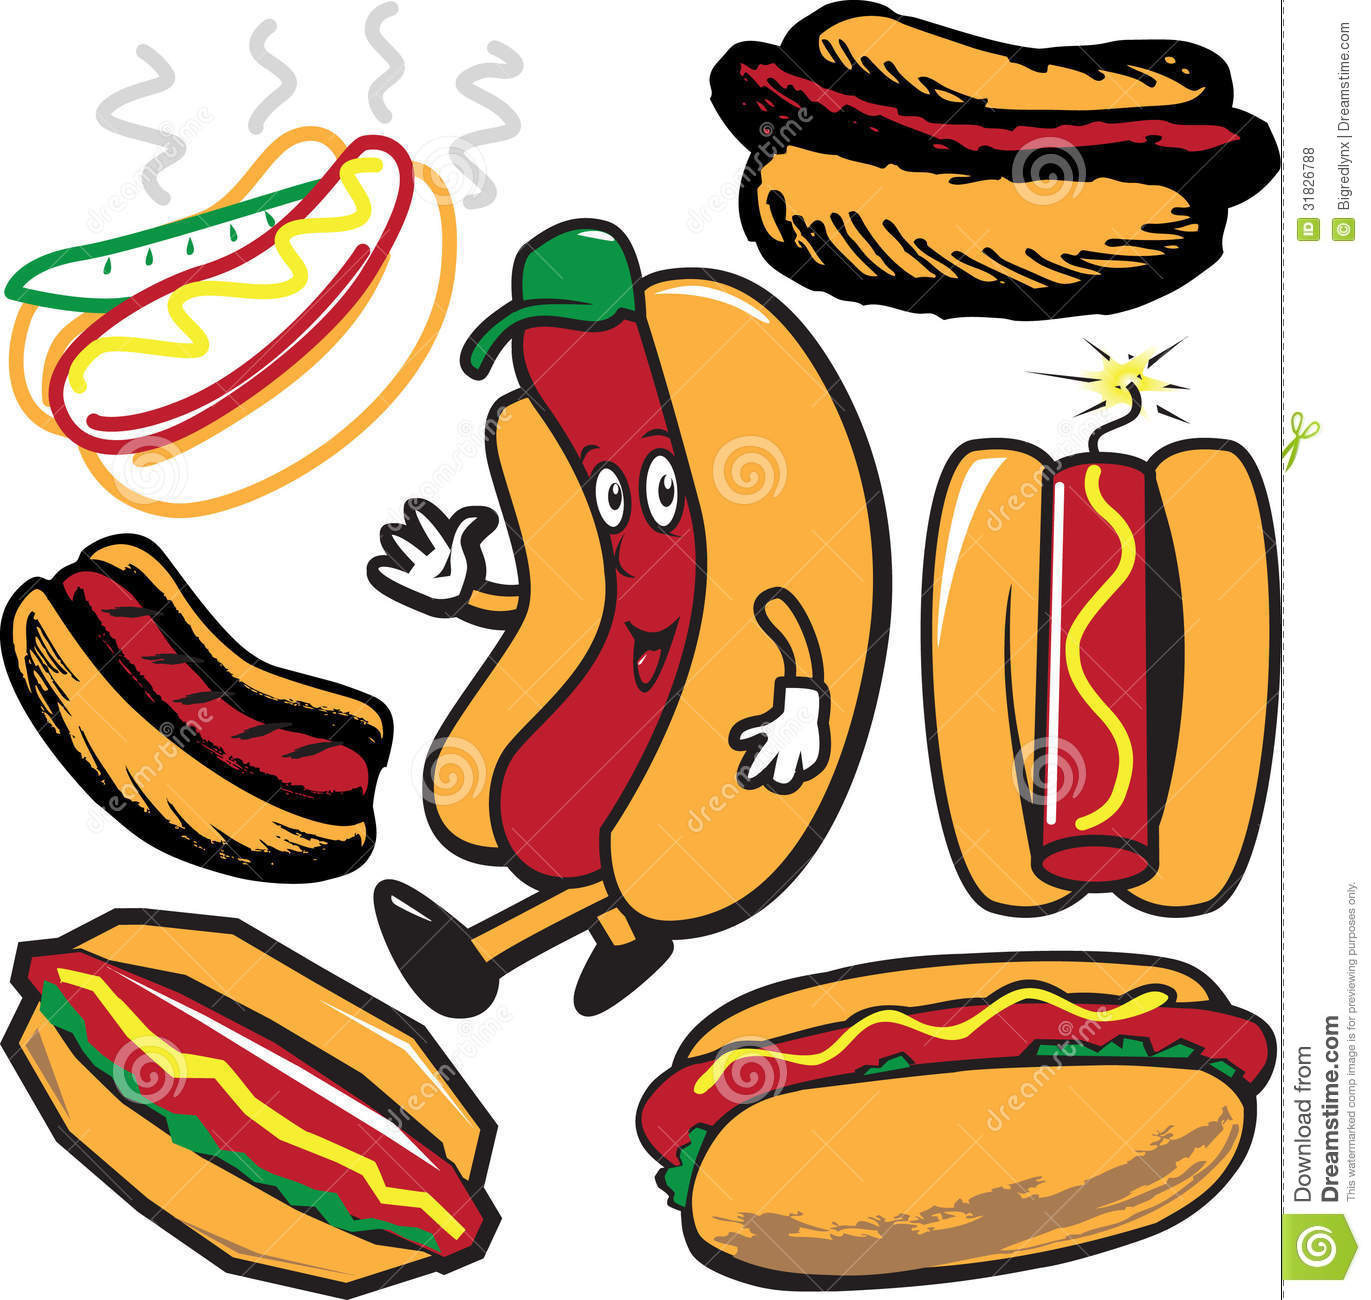 relish clipart u0026middot; corrosion clipart u0026middot; hotdog clipart